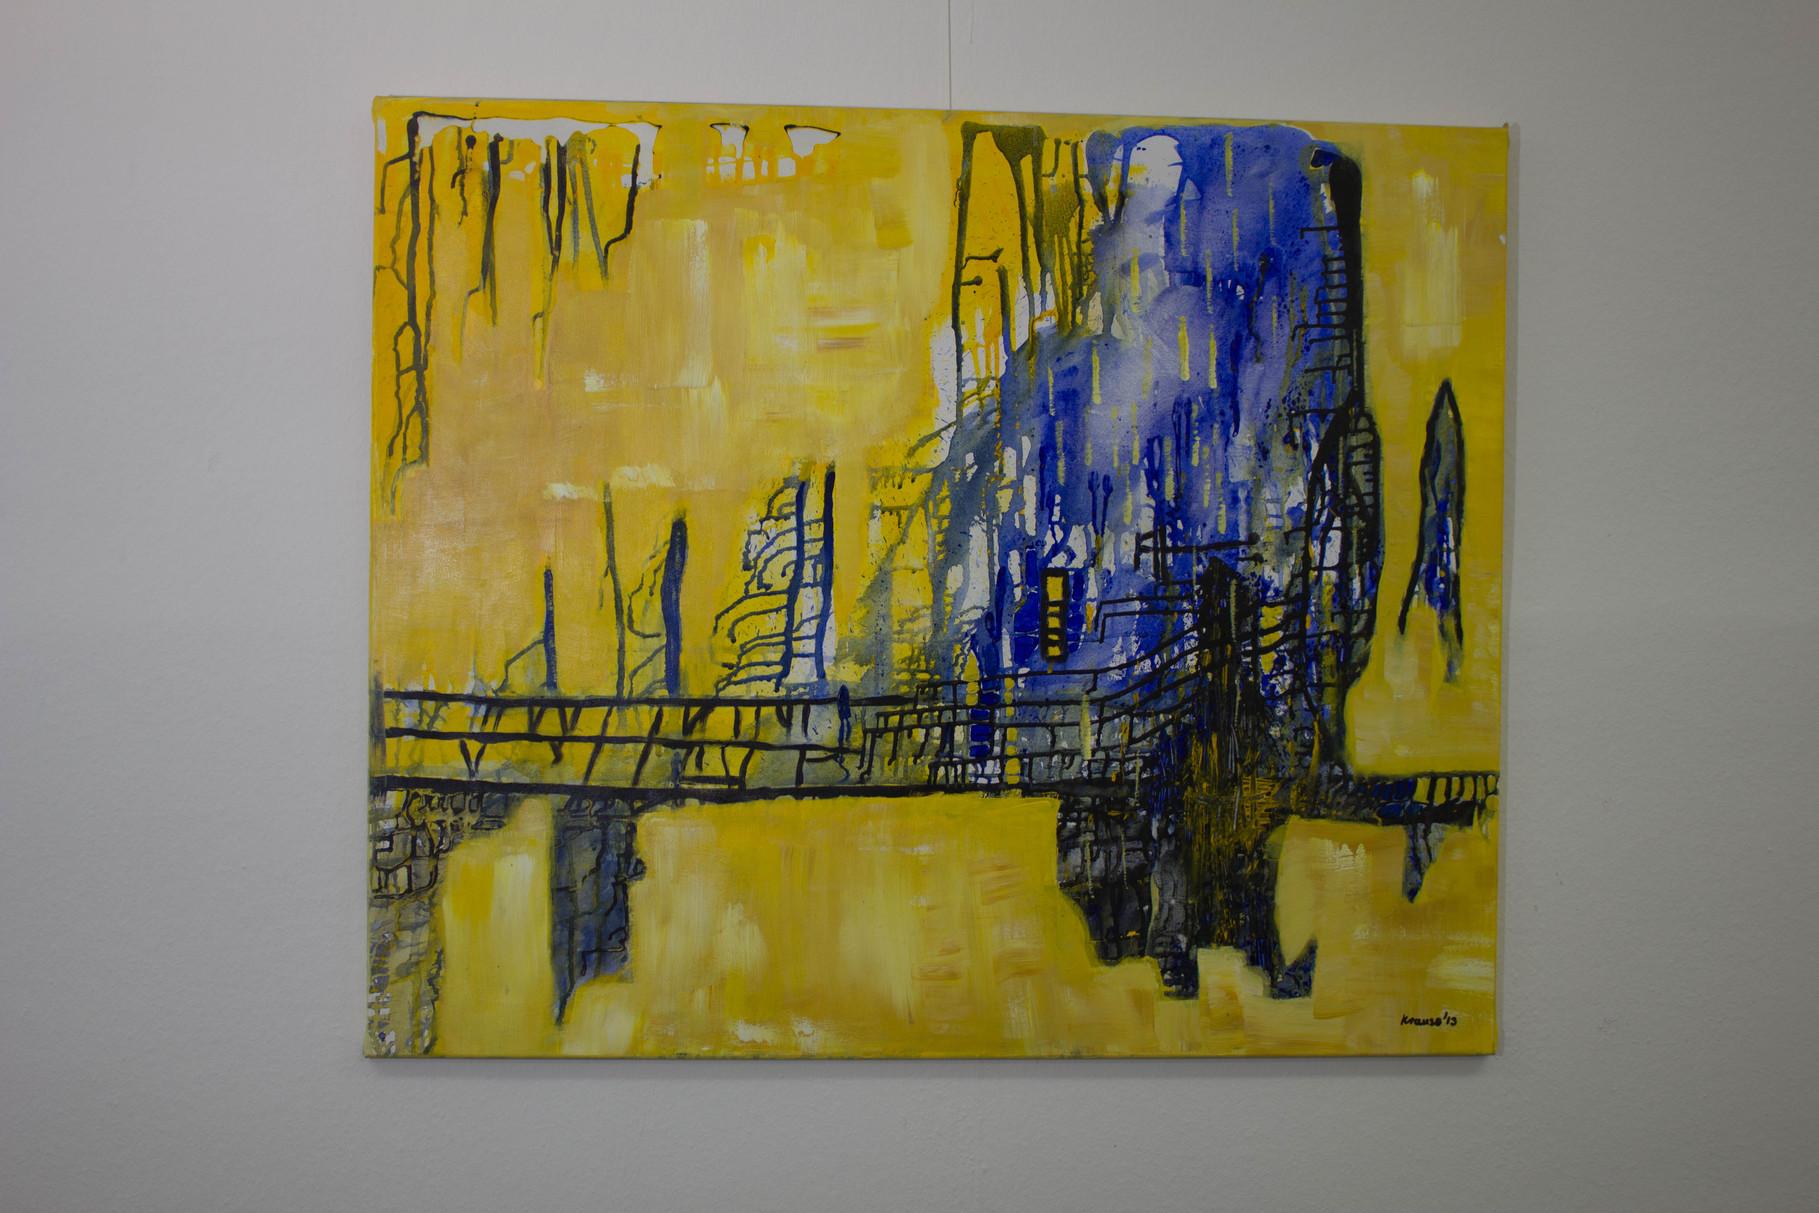 Nr. 33 Dietmar Krause, Acryl auf Leinwand